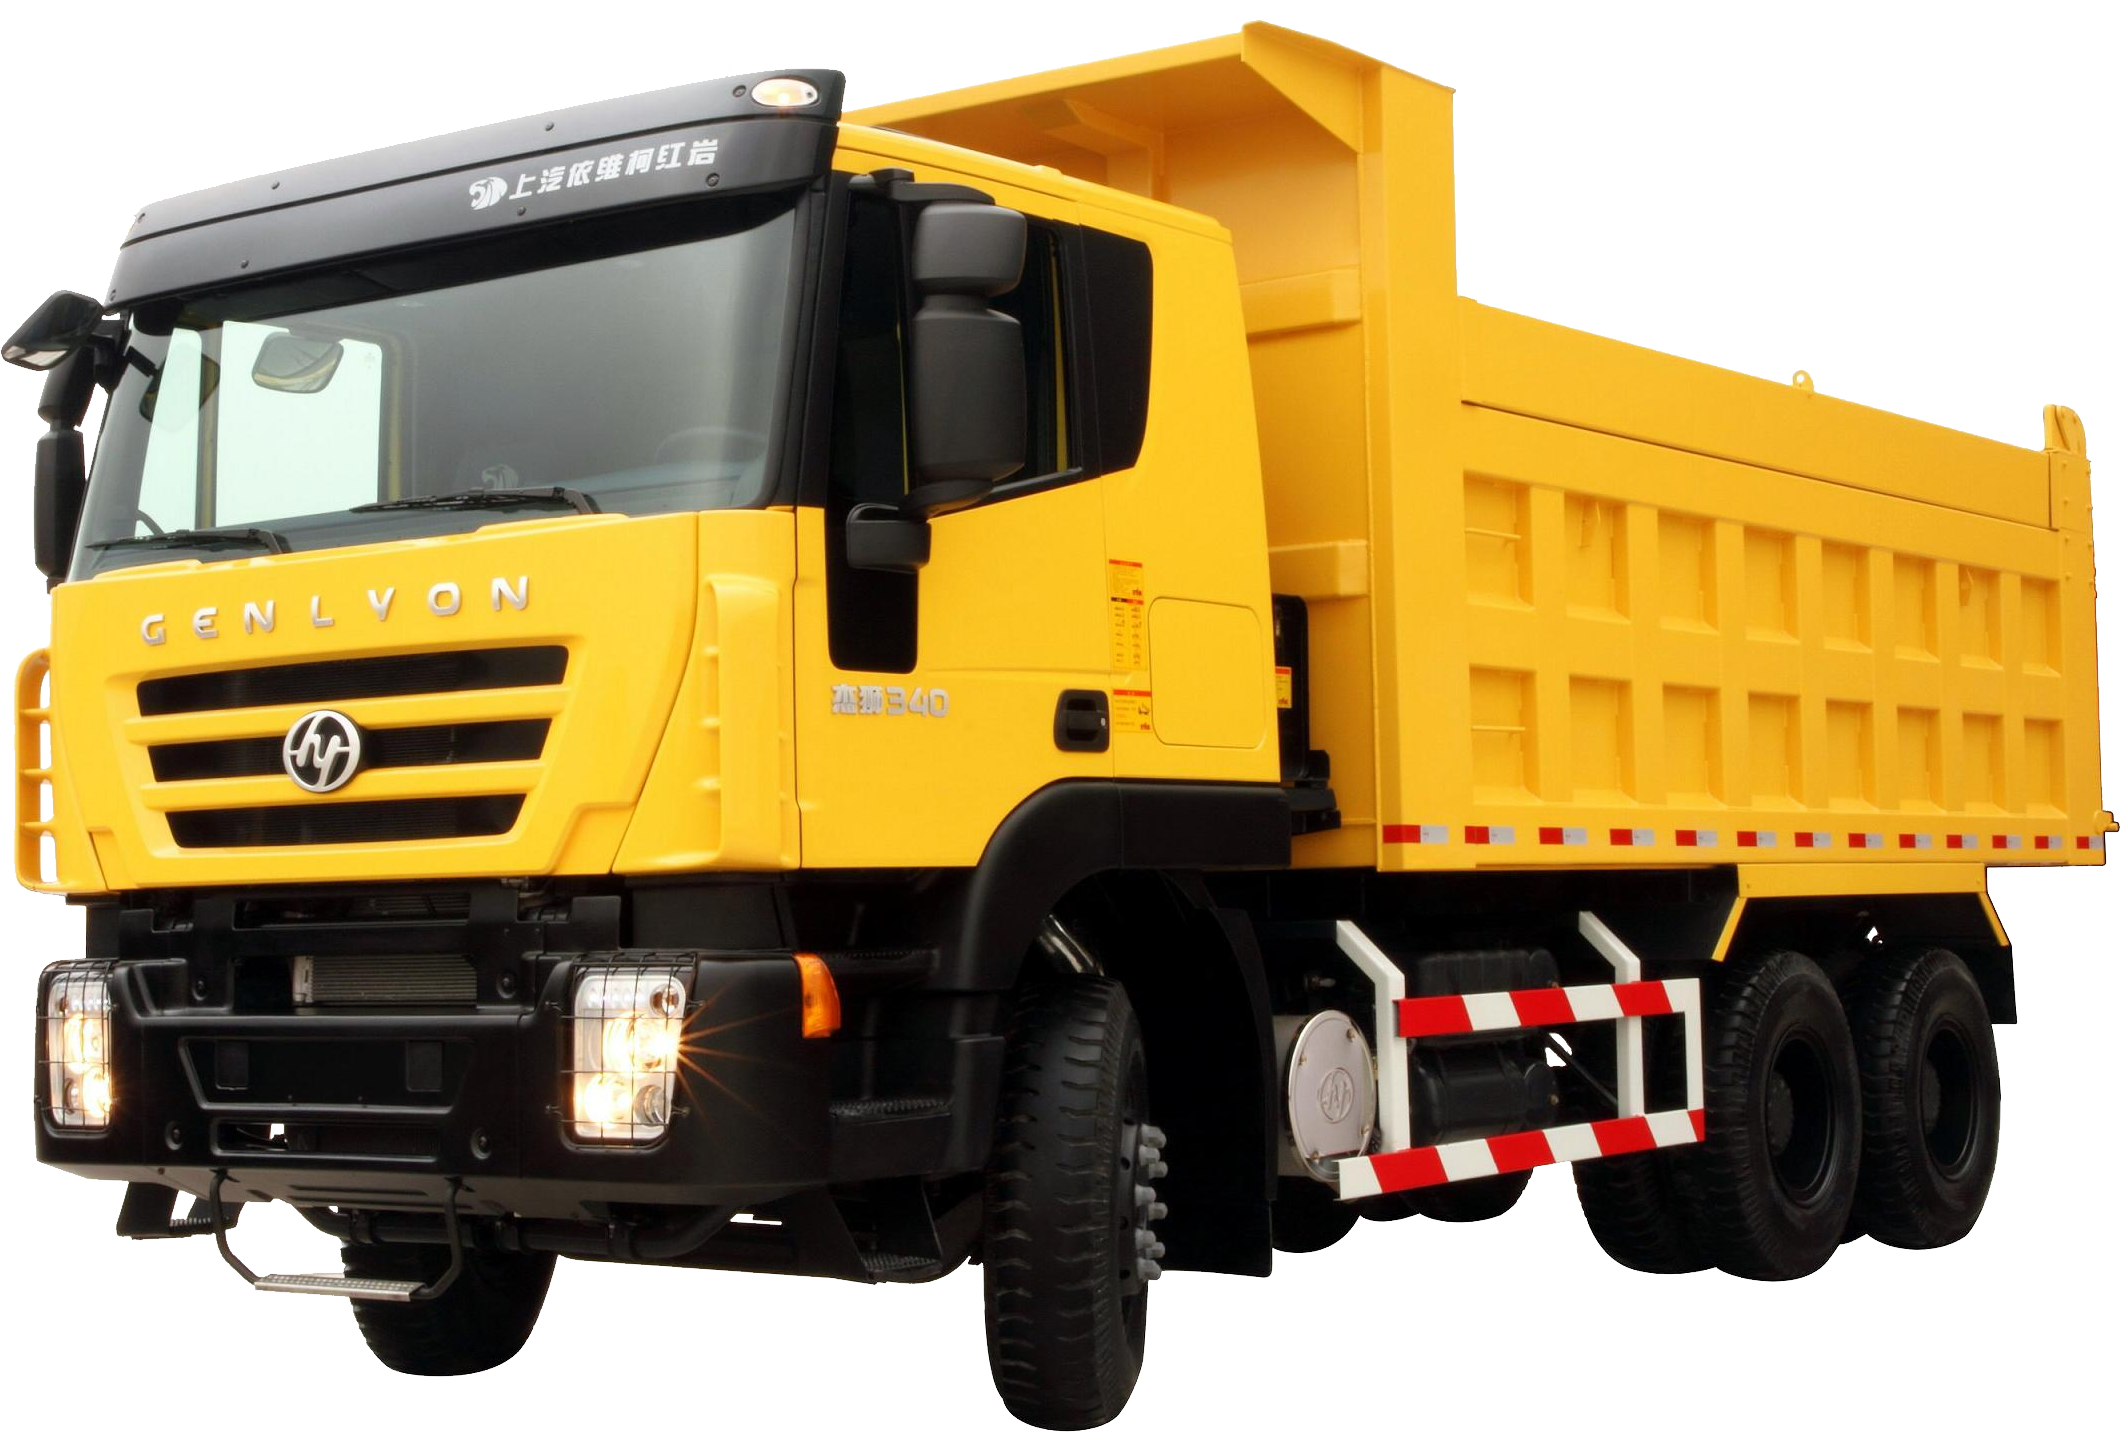 Truck transparent image